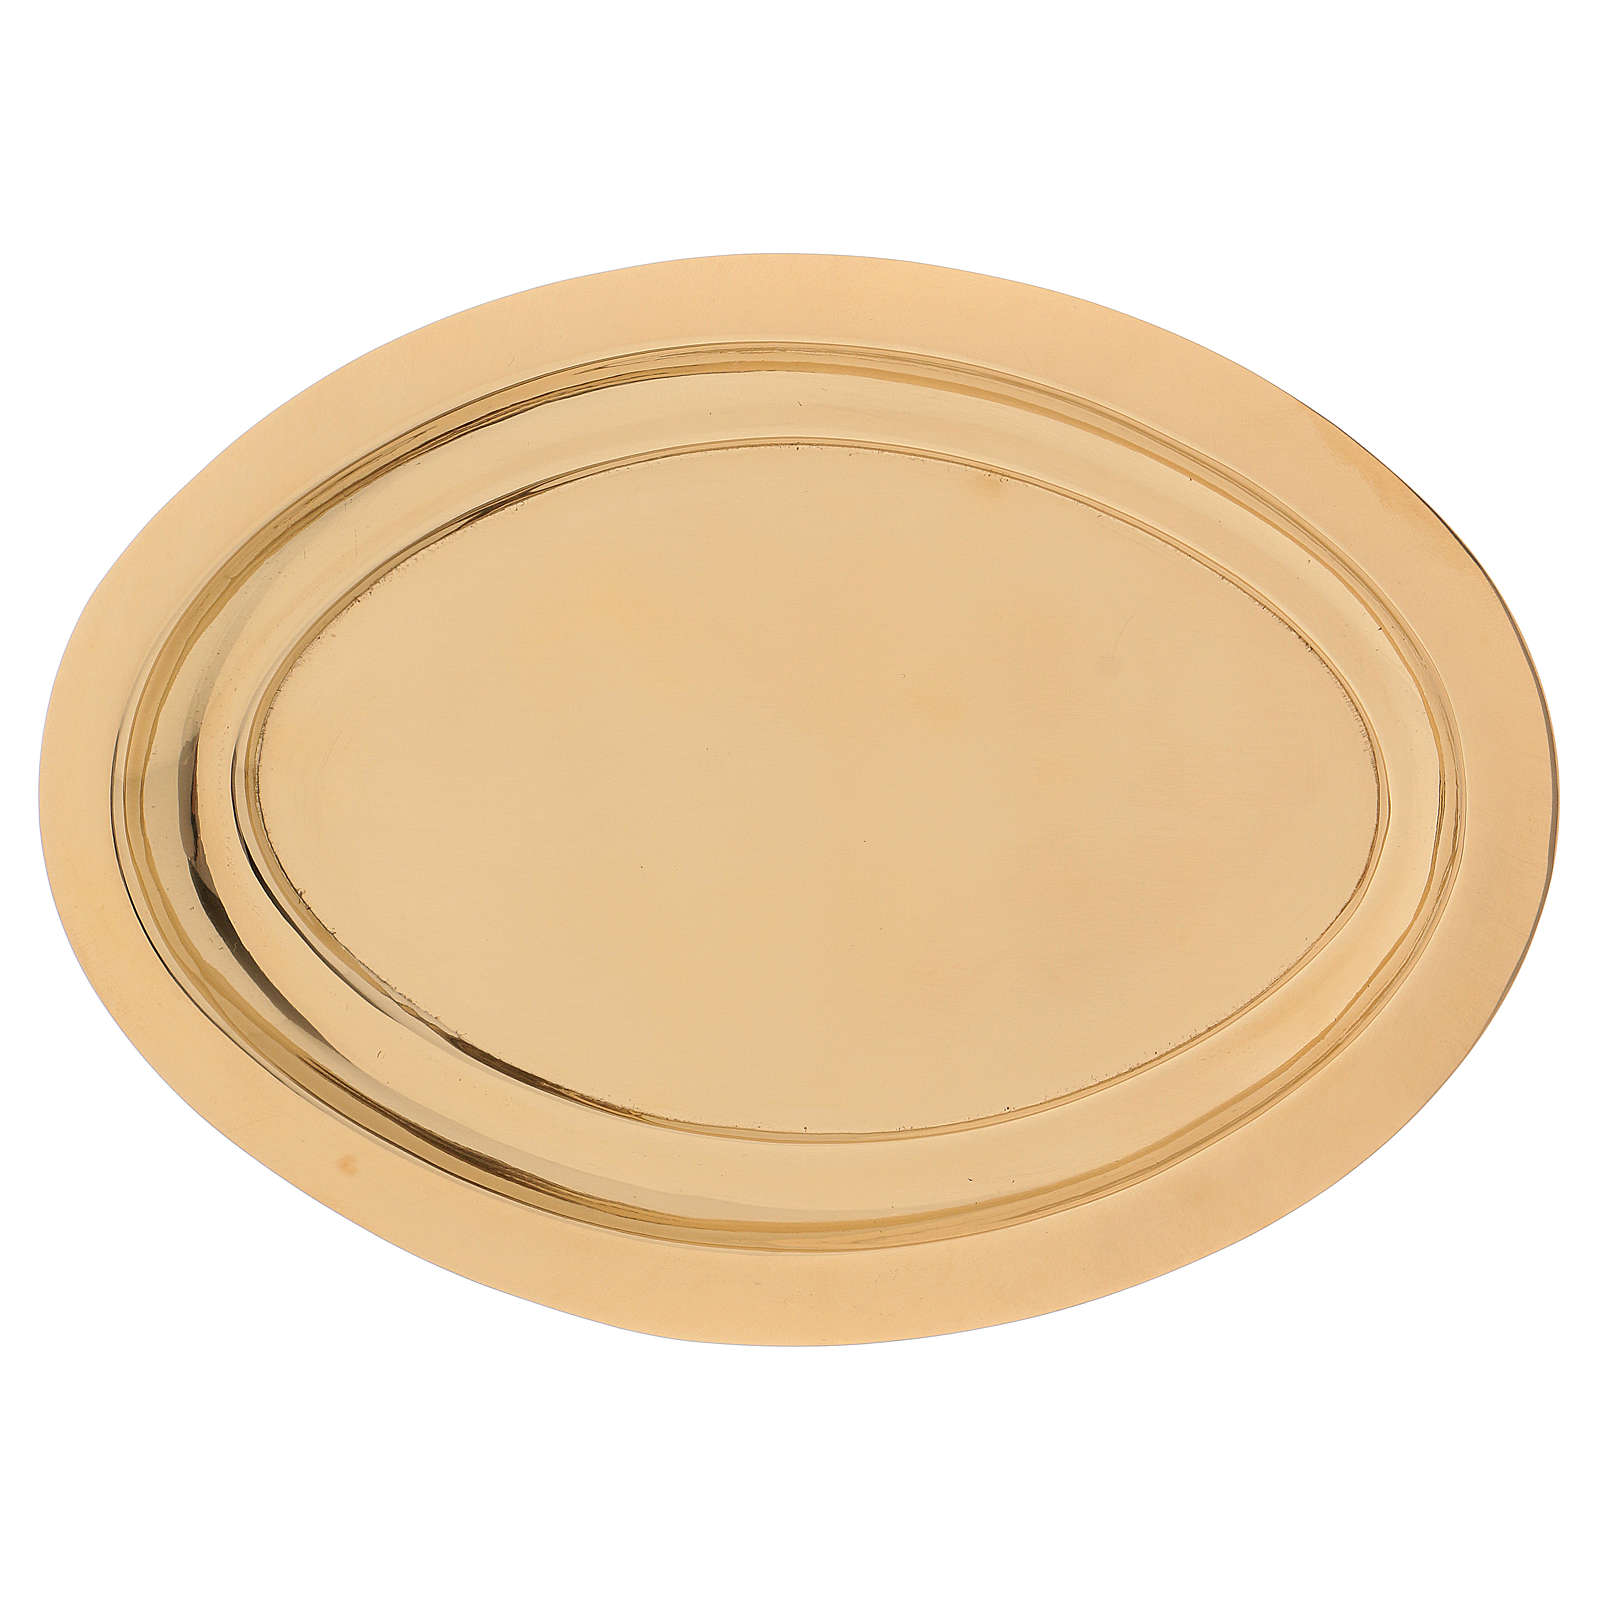 Portacandele ovale ottone dorato lucido 16x9,5 cm  3